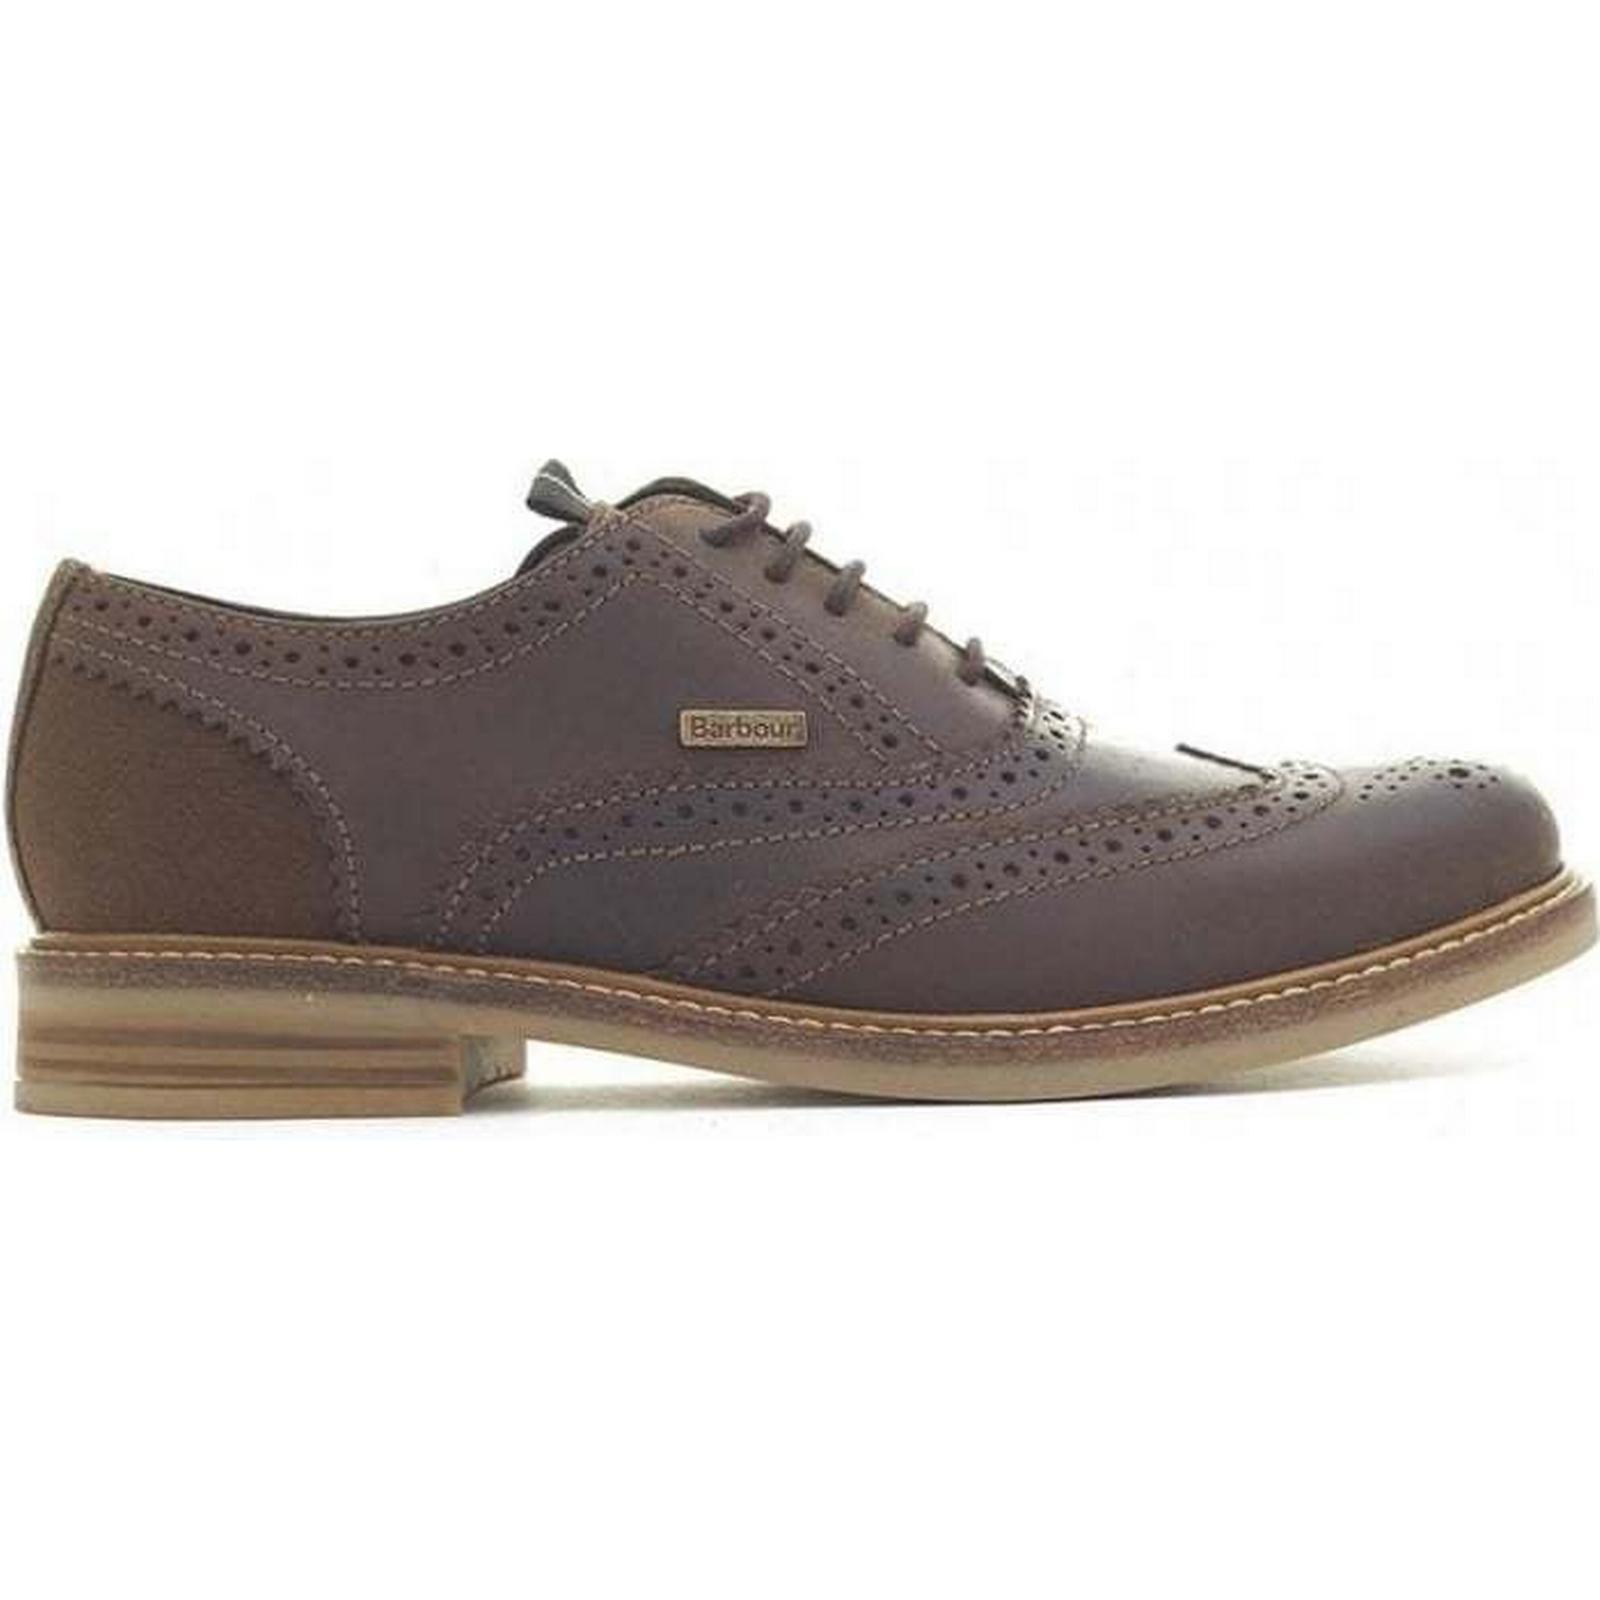 Barbour Redcar Oxford Brogues Size: Colour: BROWN, Size: Brogues 11 3e6da6